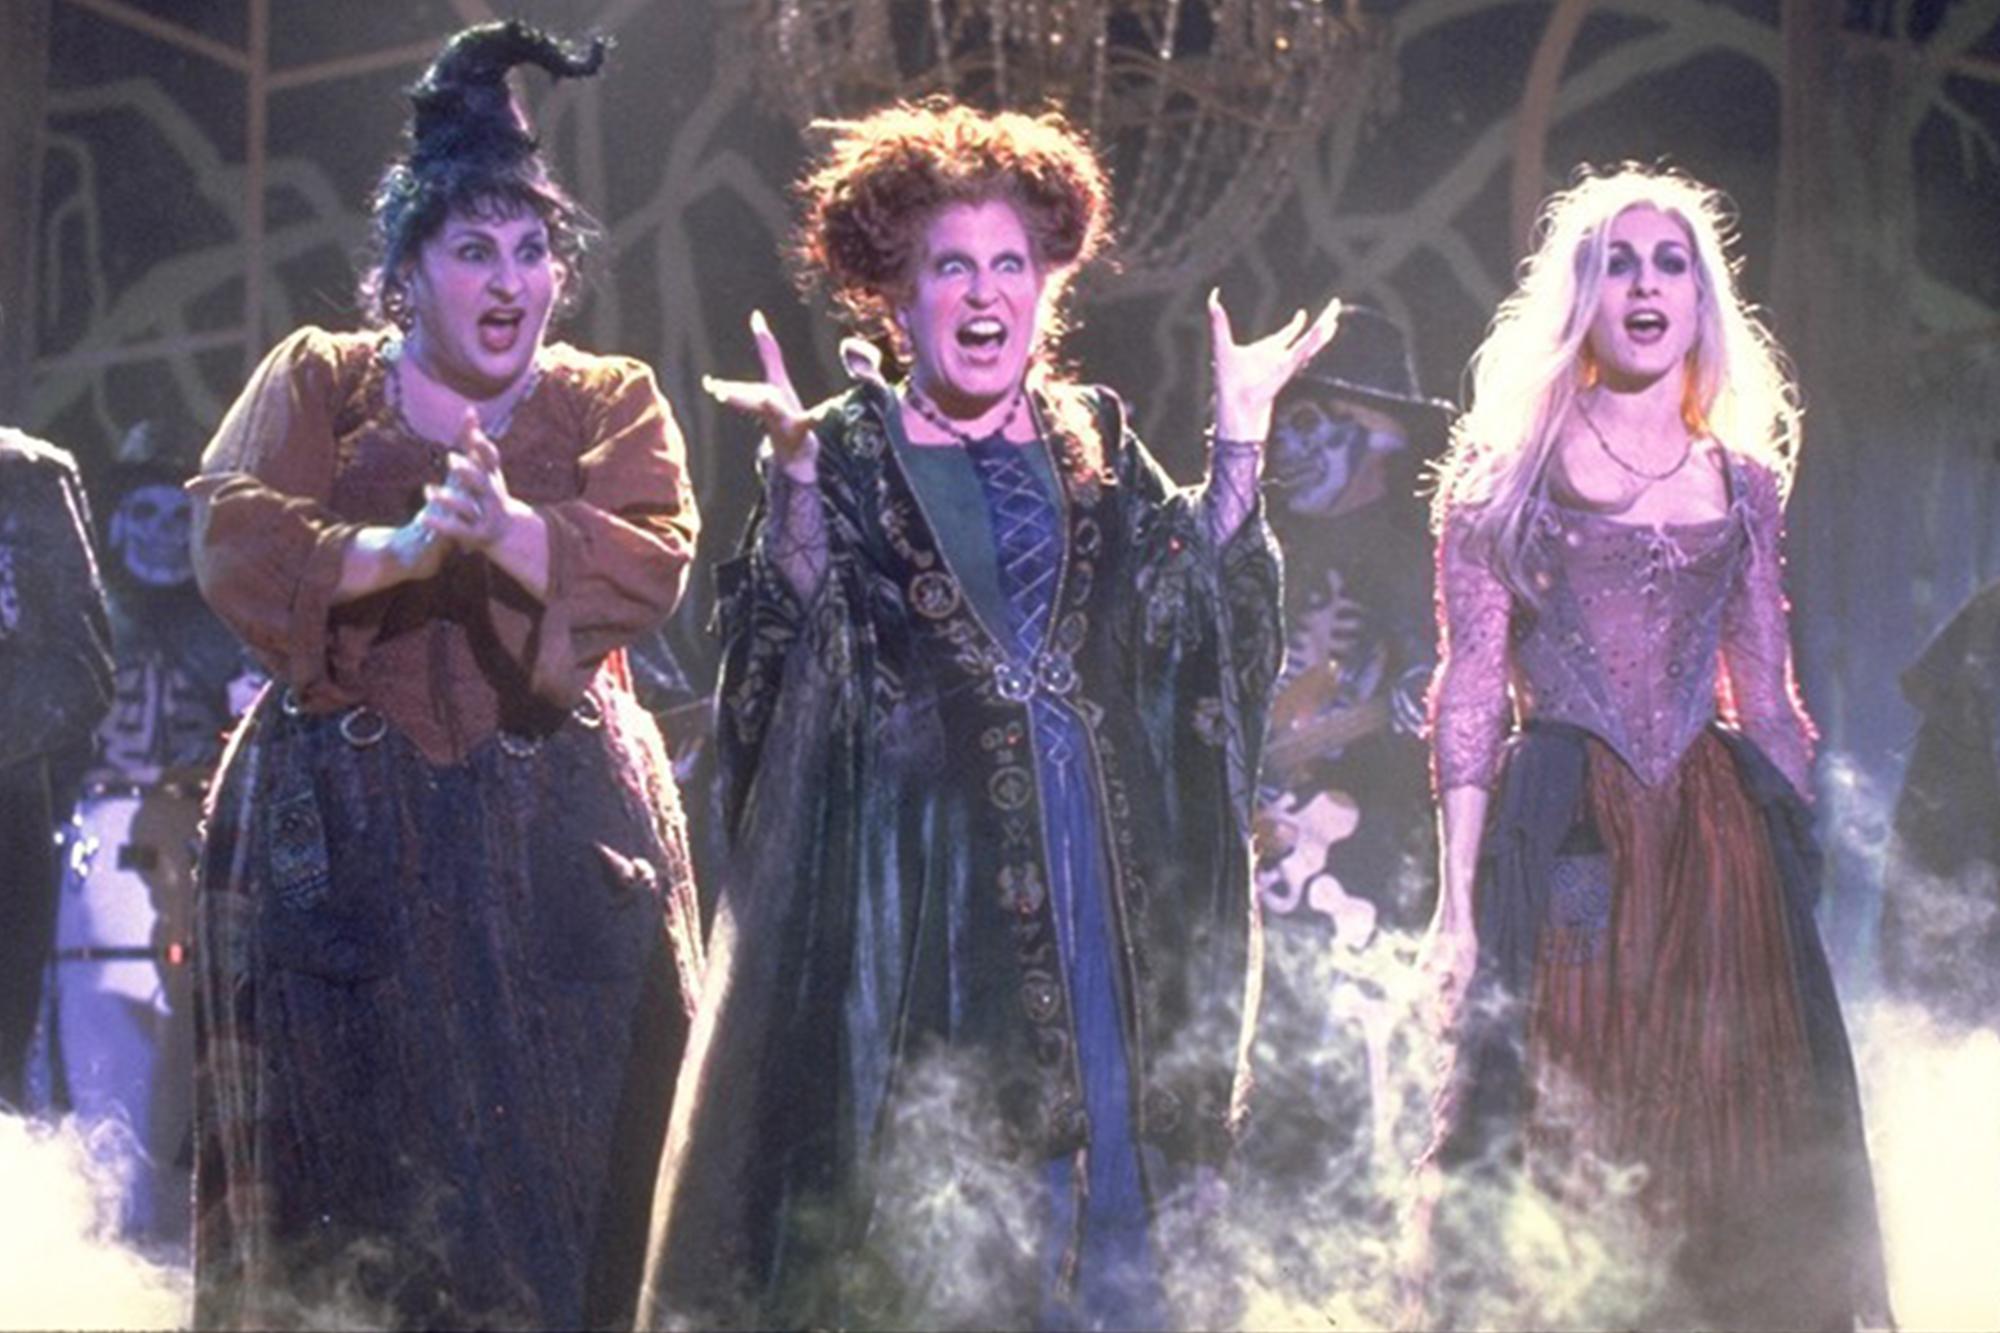 Bette Midler confirms 'Hocus Pocus' sequel with original cast